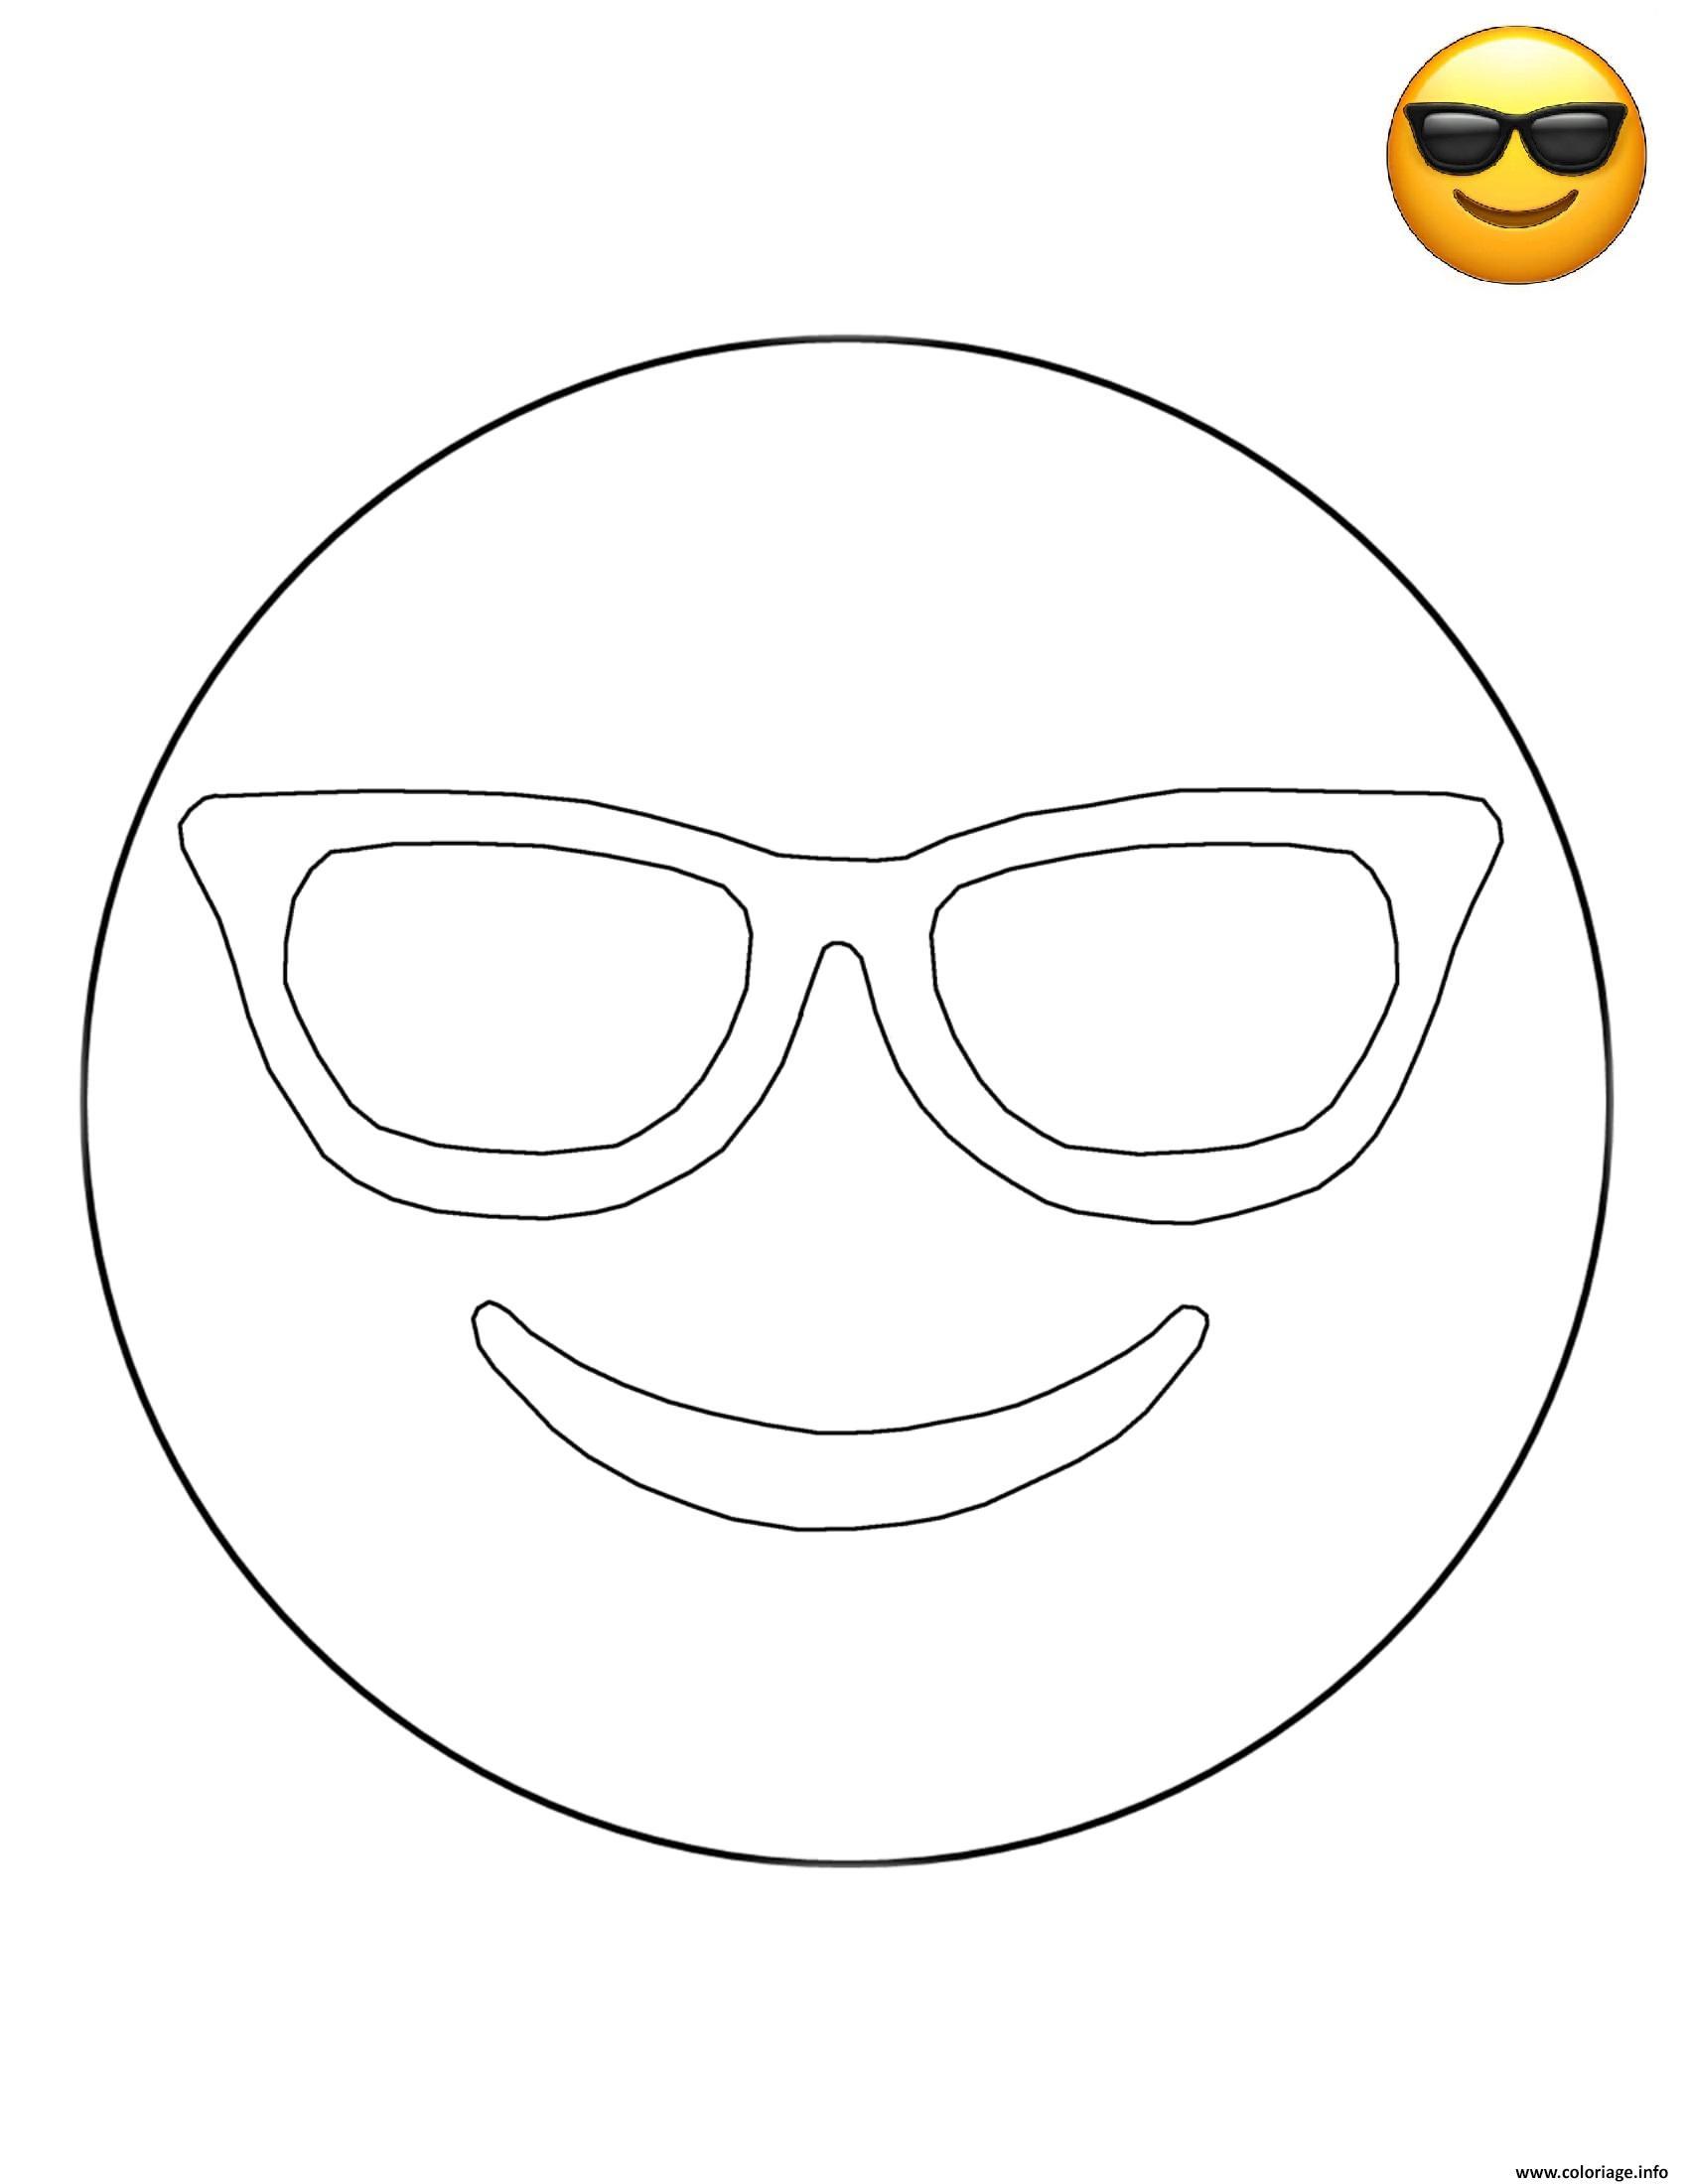 Coloriage Emoji Sunglasses Smiley Jecolorie Com